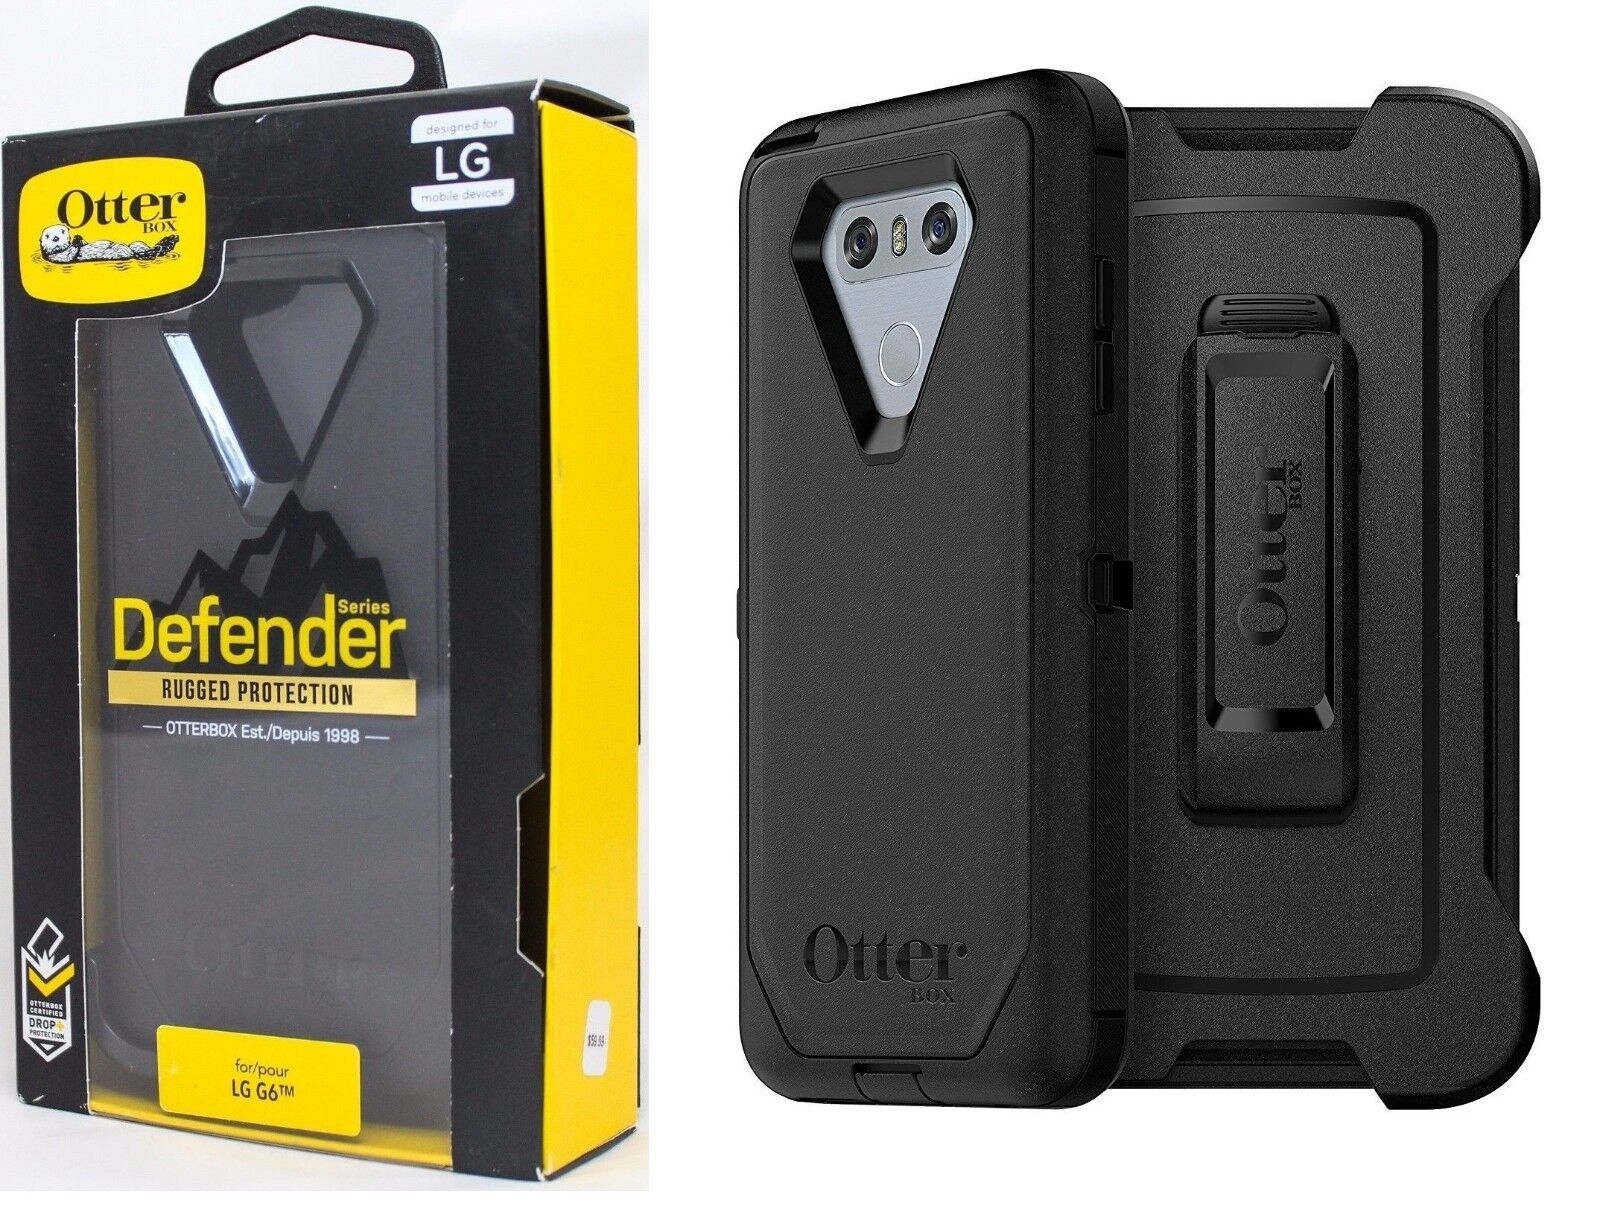 OtterBox Defender Series Case with Belt Clip Holster for LG G6 G6 Plus Black